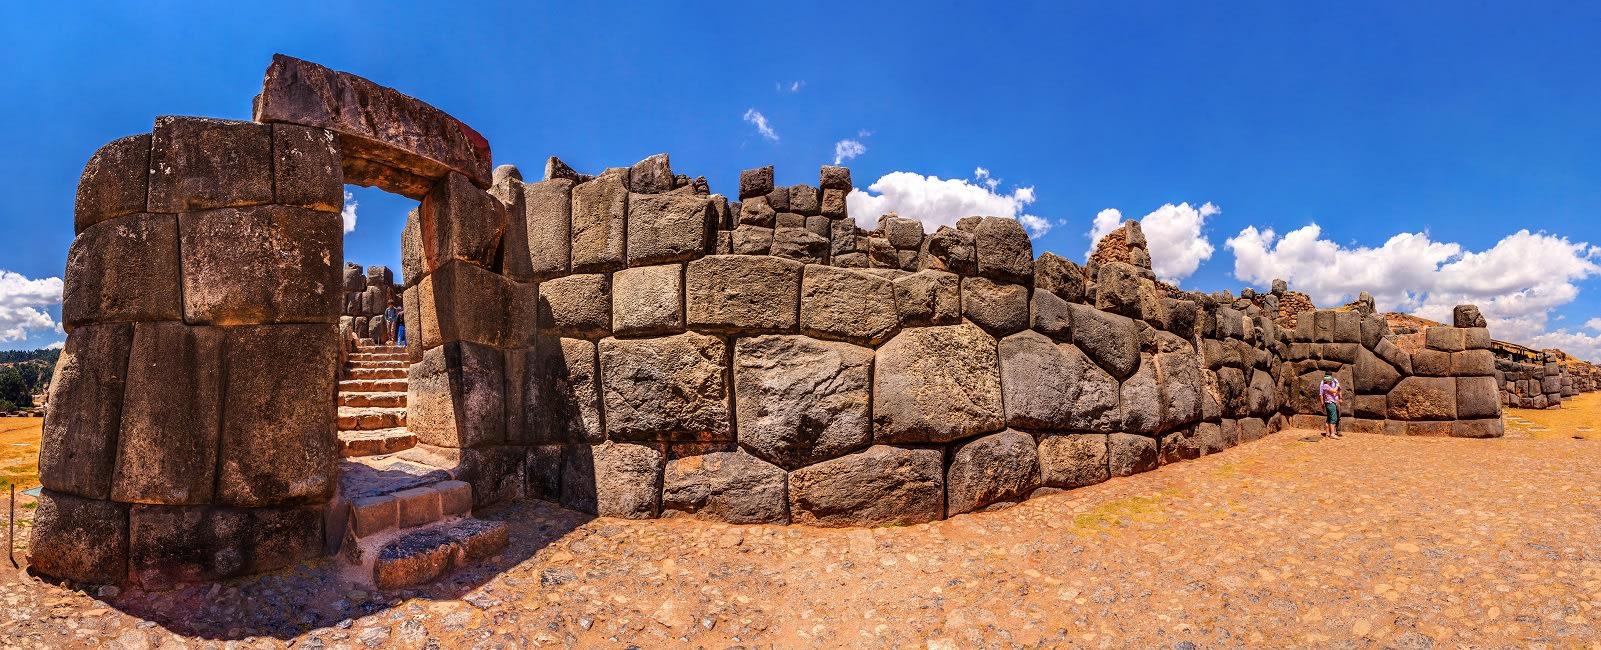 Panoramic View Of Sacsayhuaman Fortress In Cusco, Peru